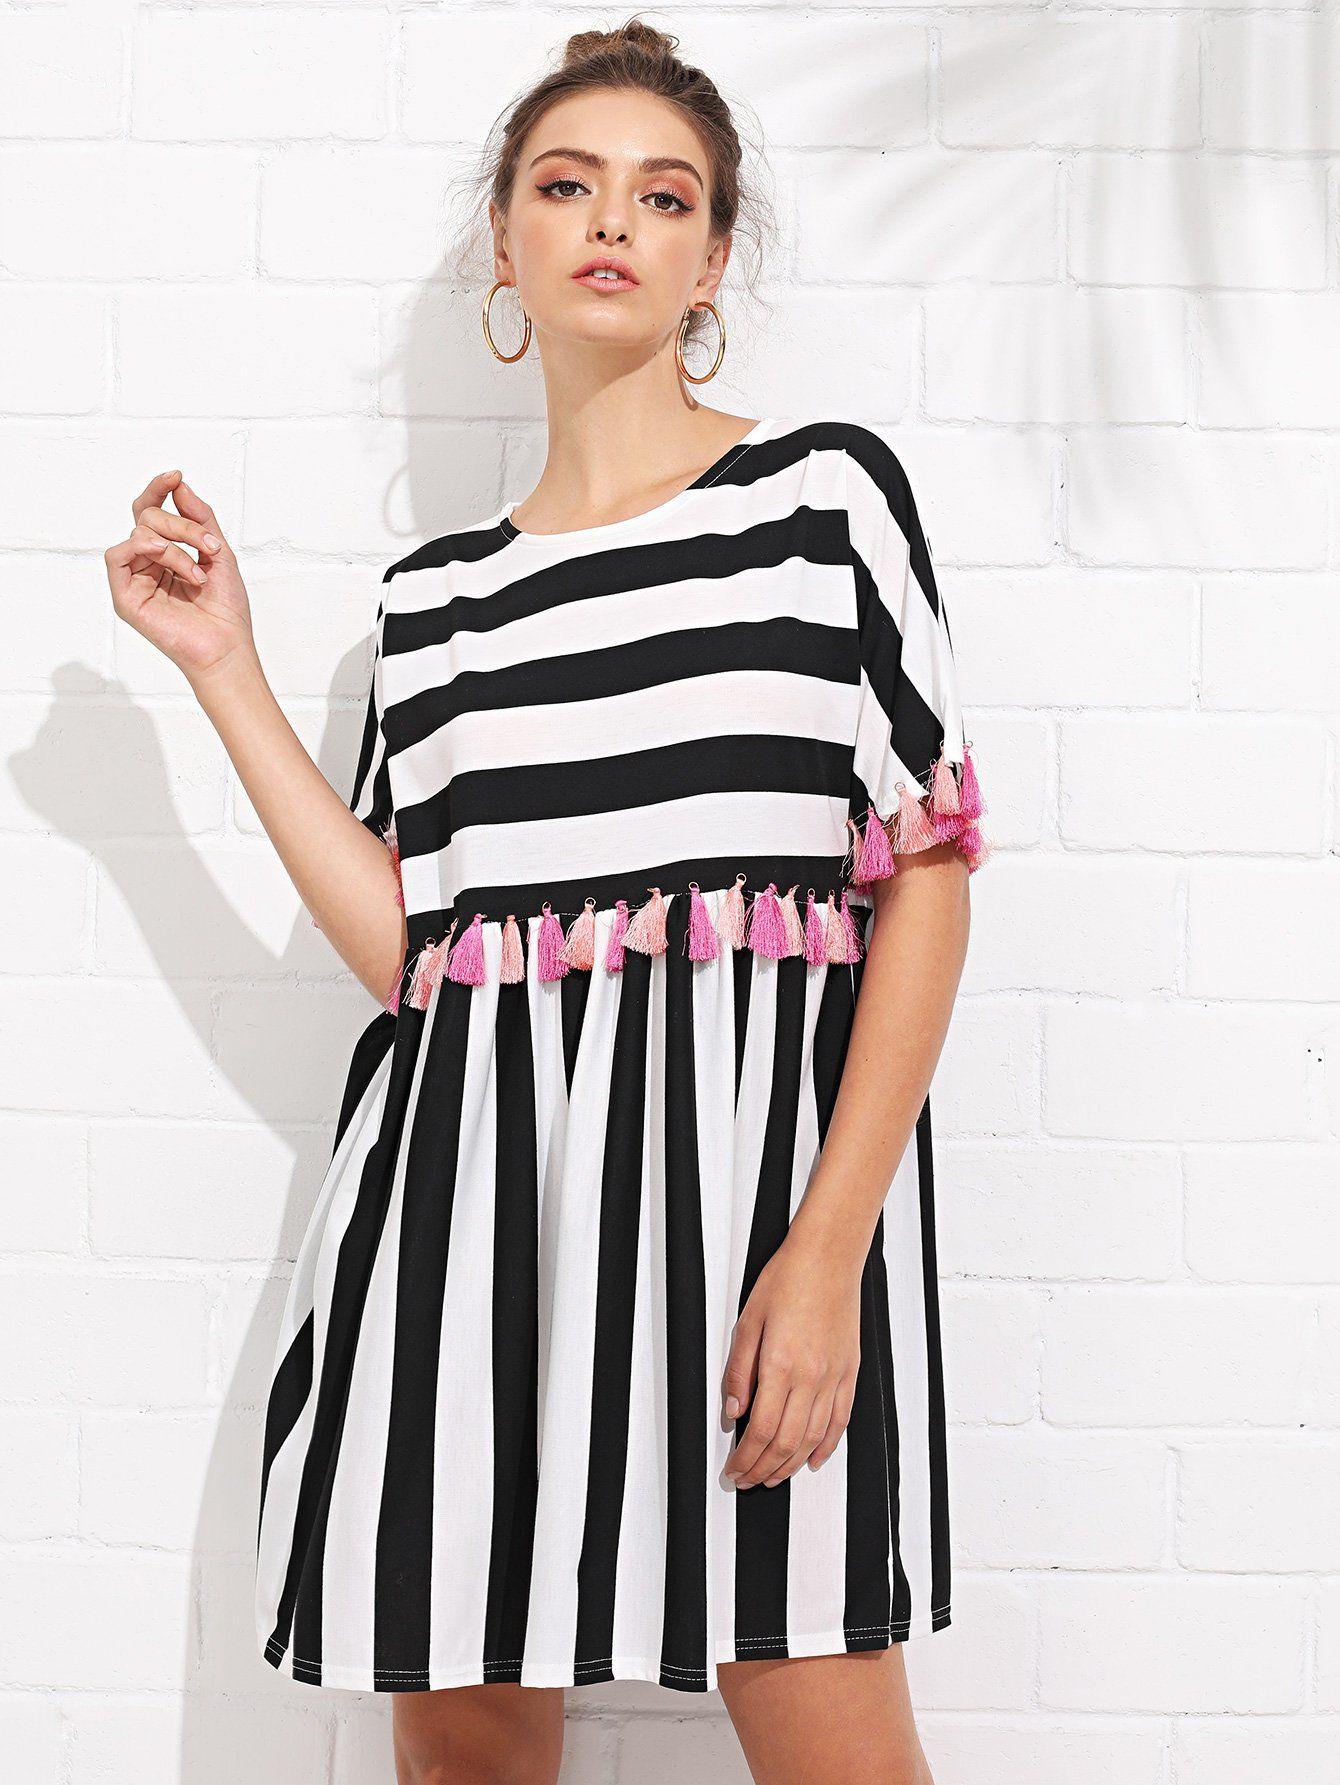 Fringe Trim Striped Dress Shein Sheinside Striped Casual Dresses Black Striped Dress Dresses [ 1785 x 1340 Pixel ]